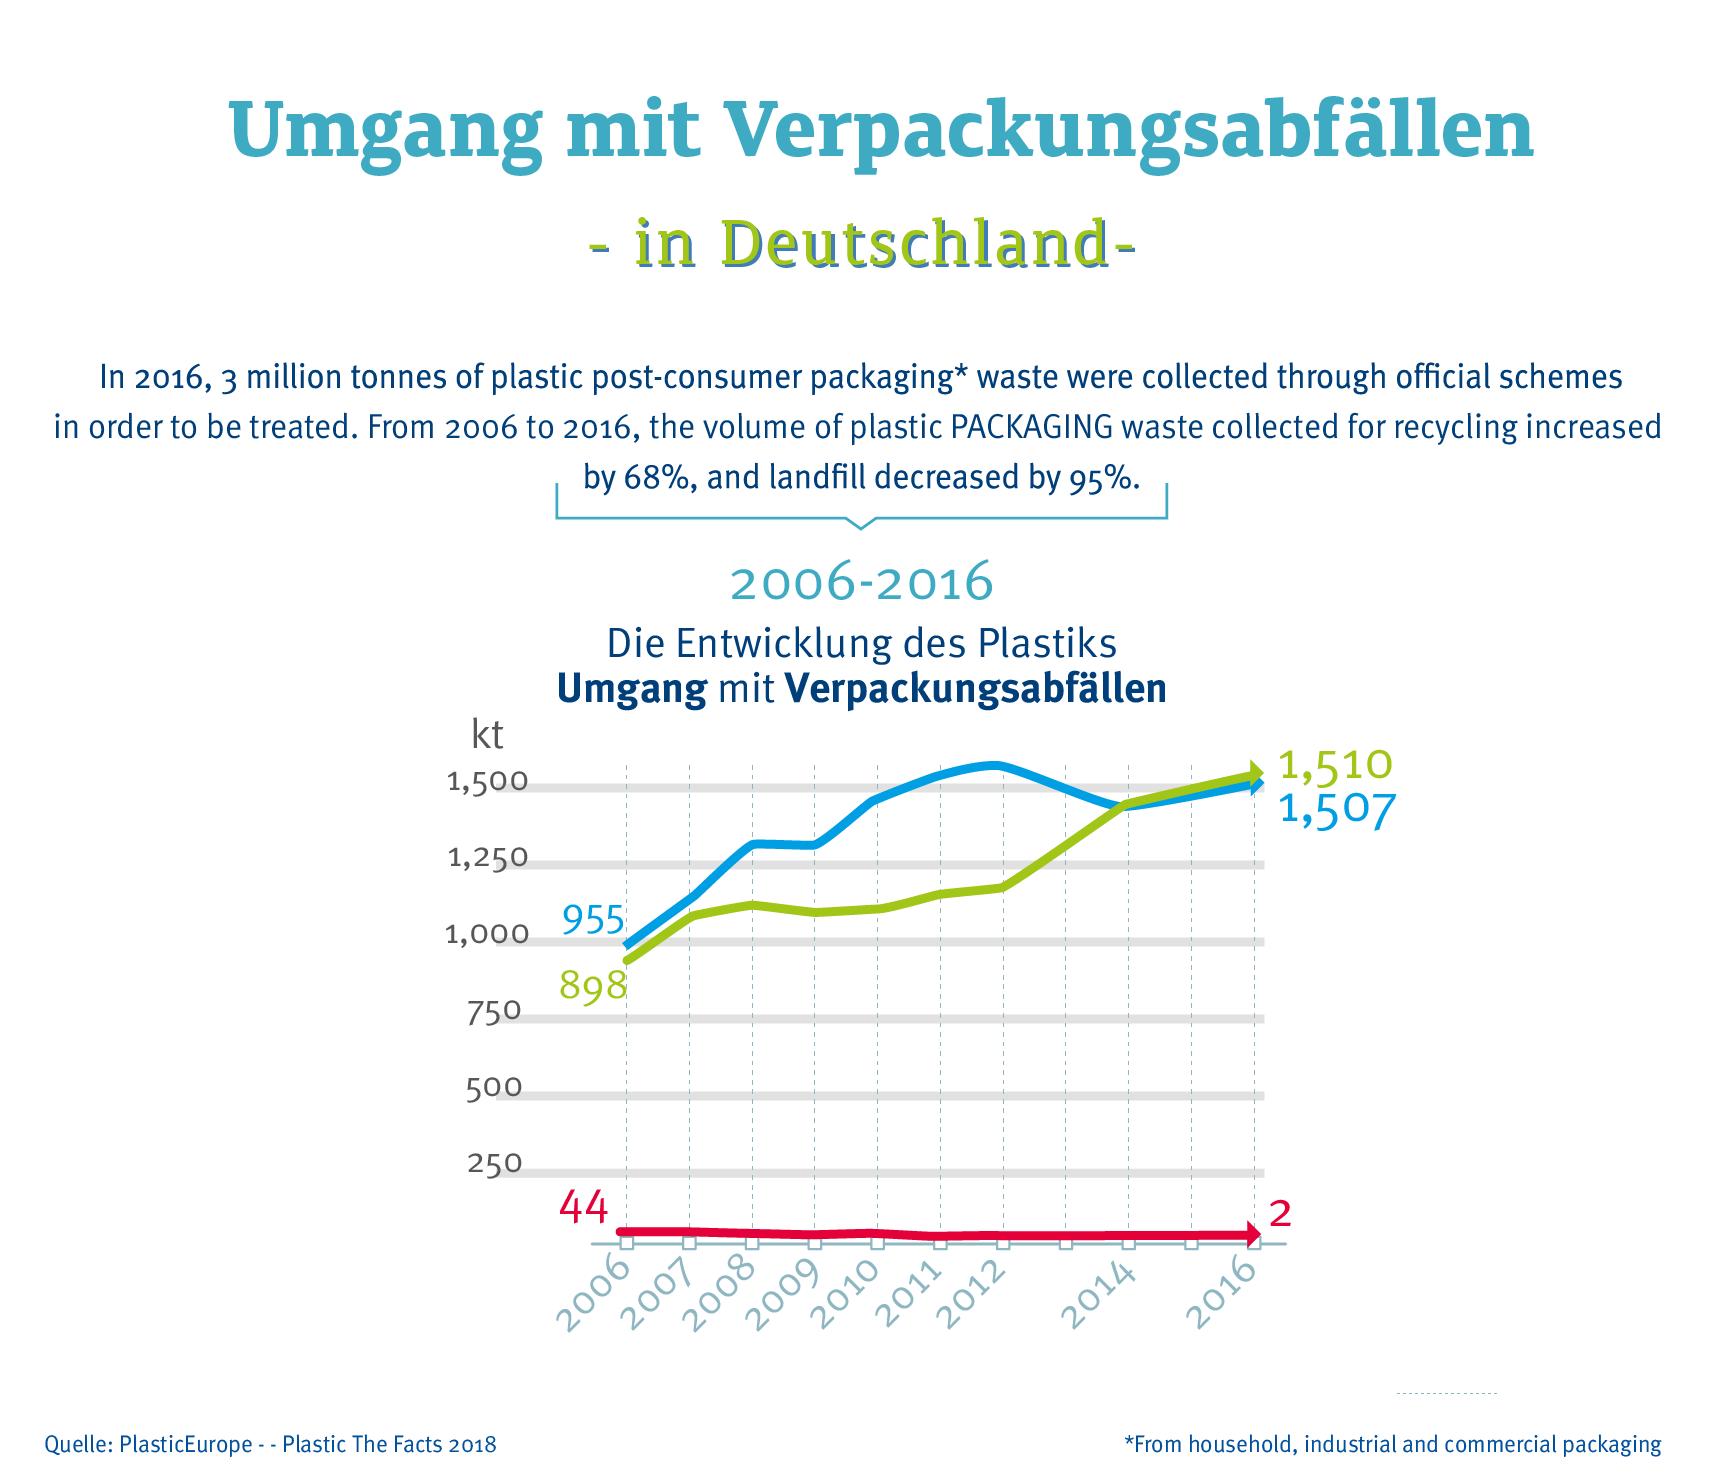 Umgang Mit Verpackungsabfaellen In Deutschland